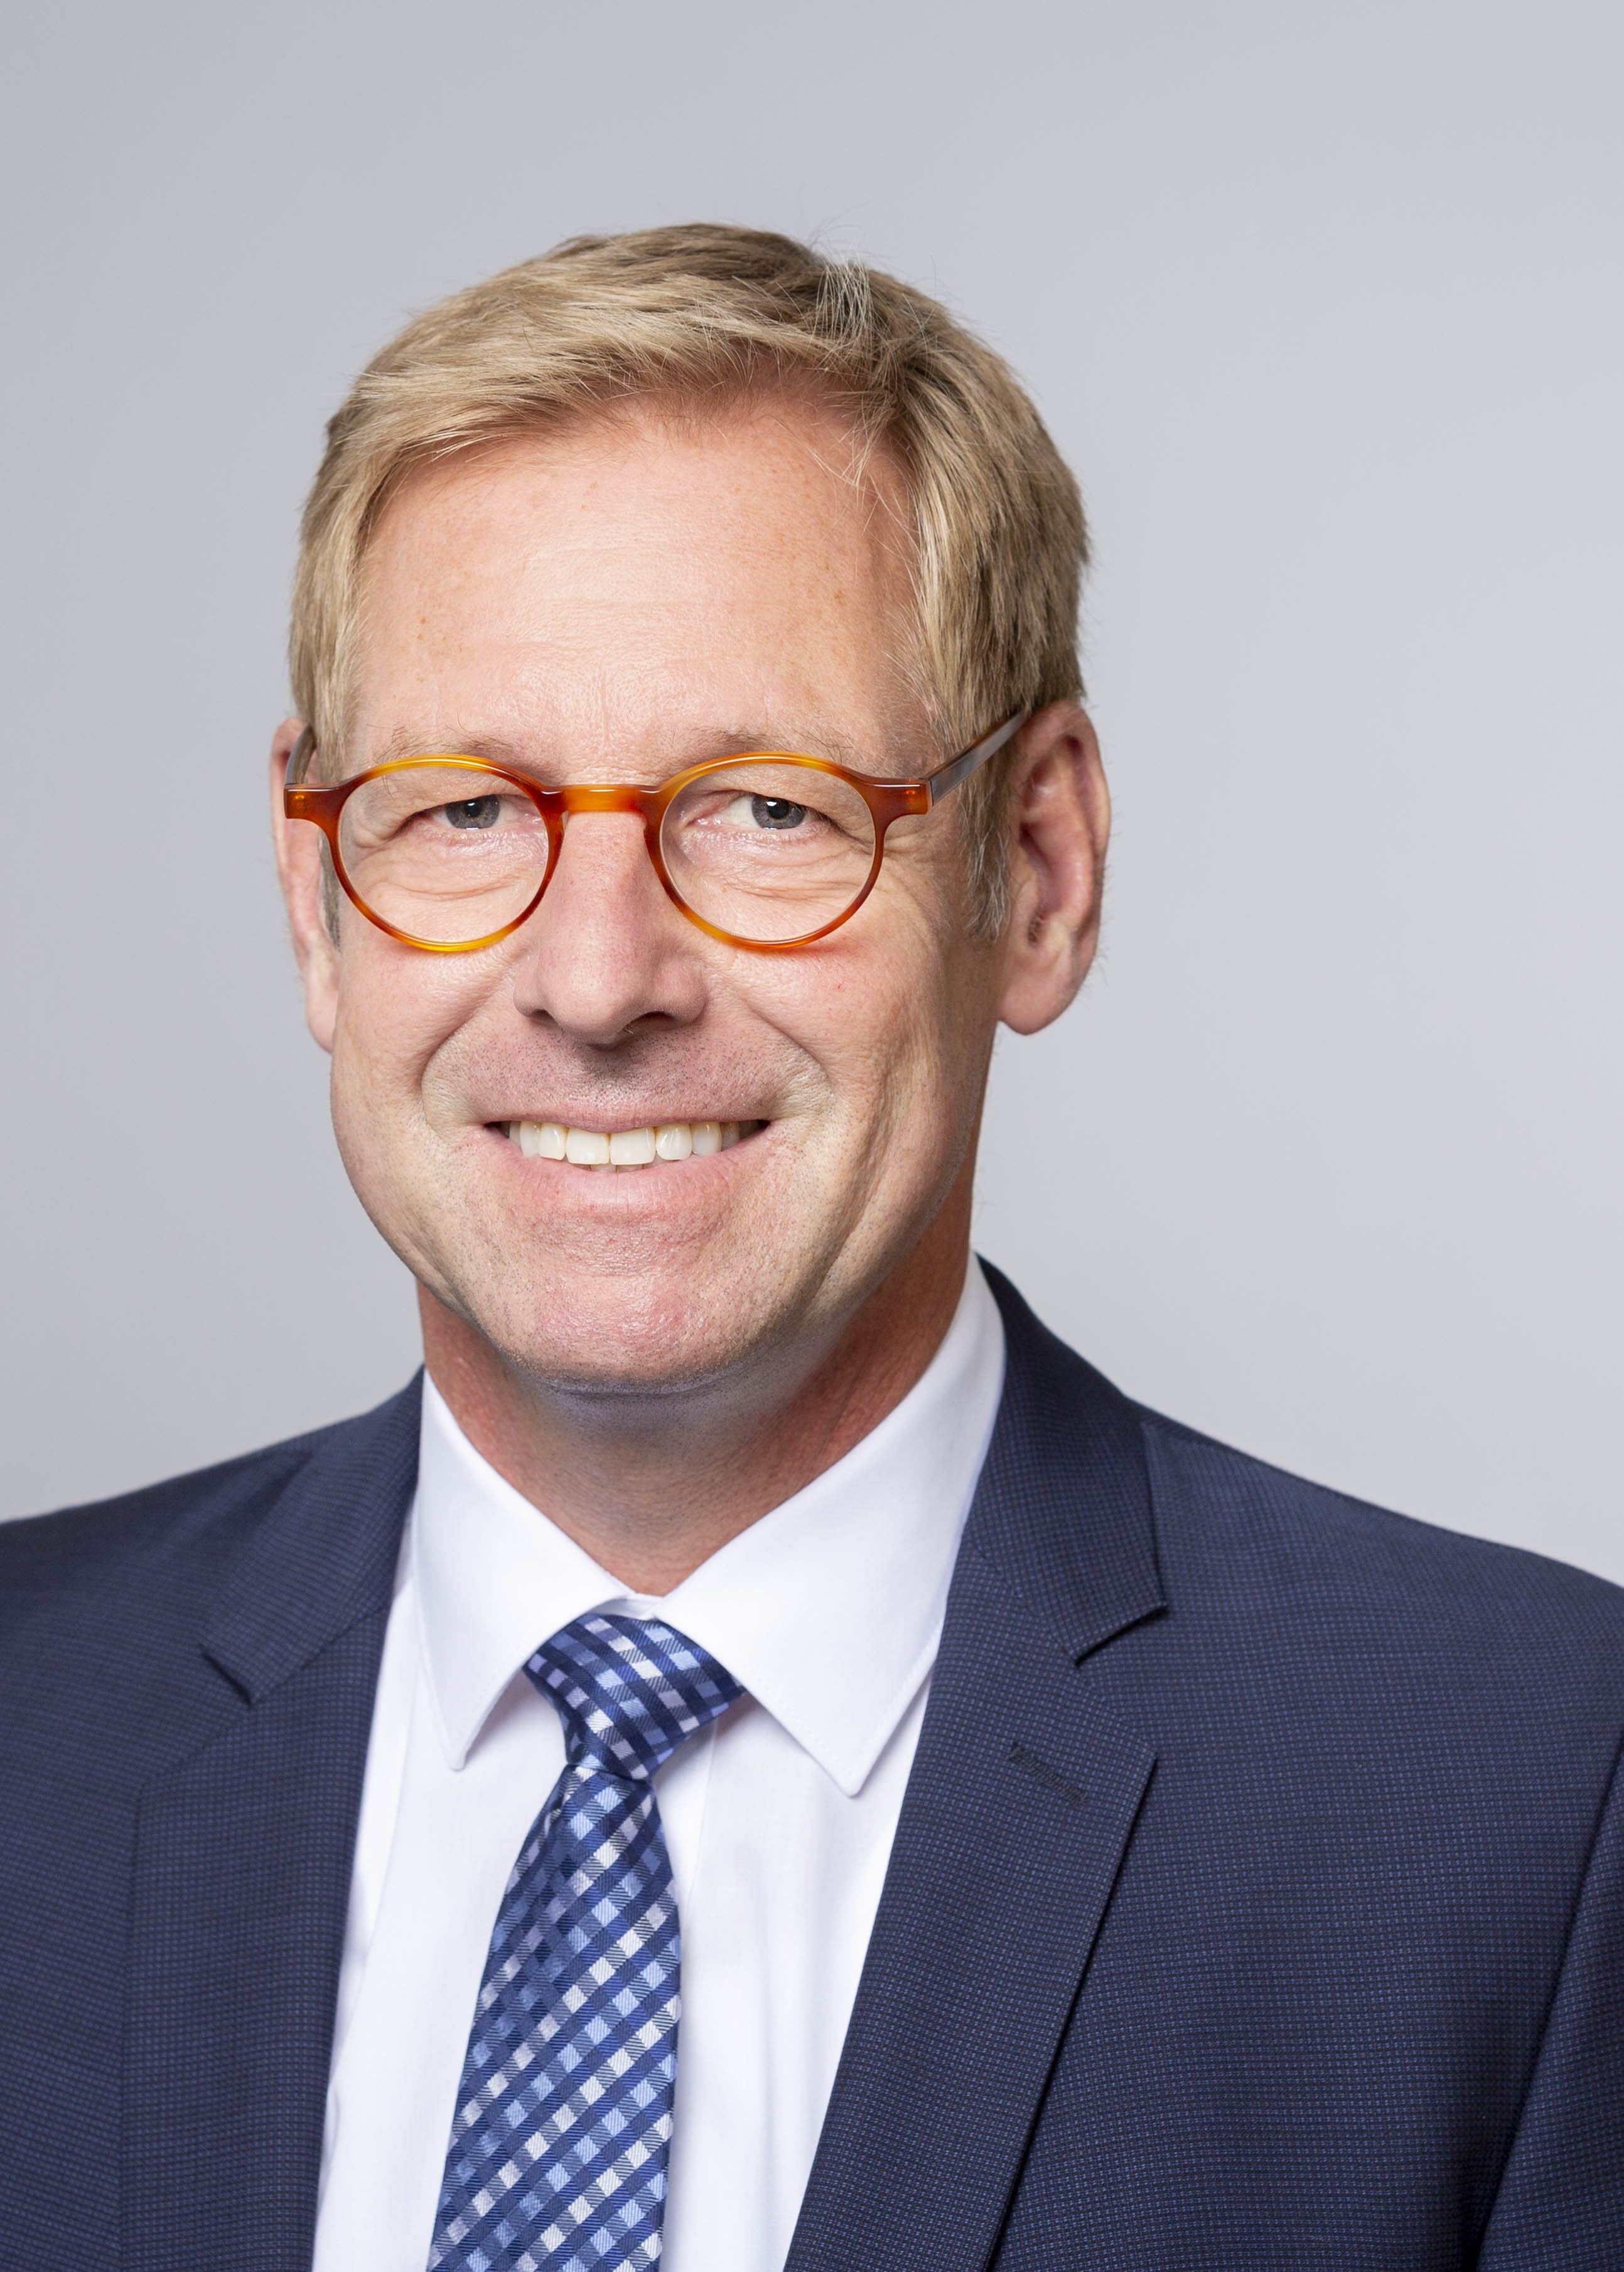 Prof. Dr. med. Christian Gerloff